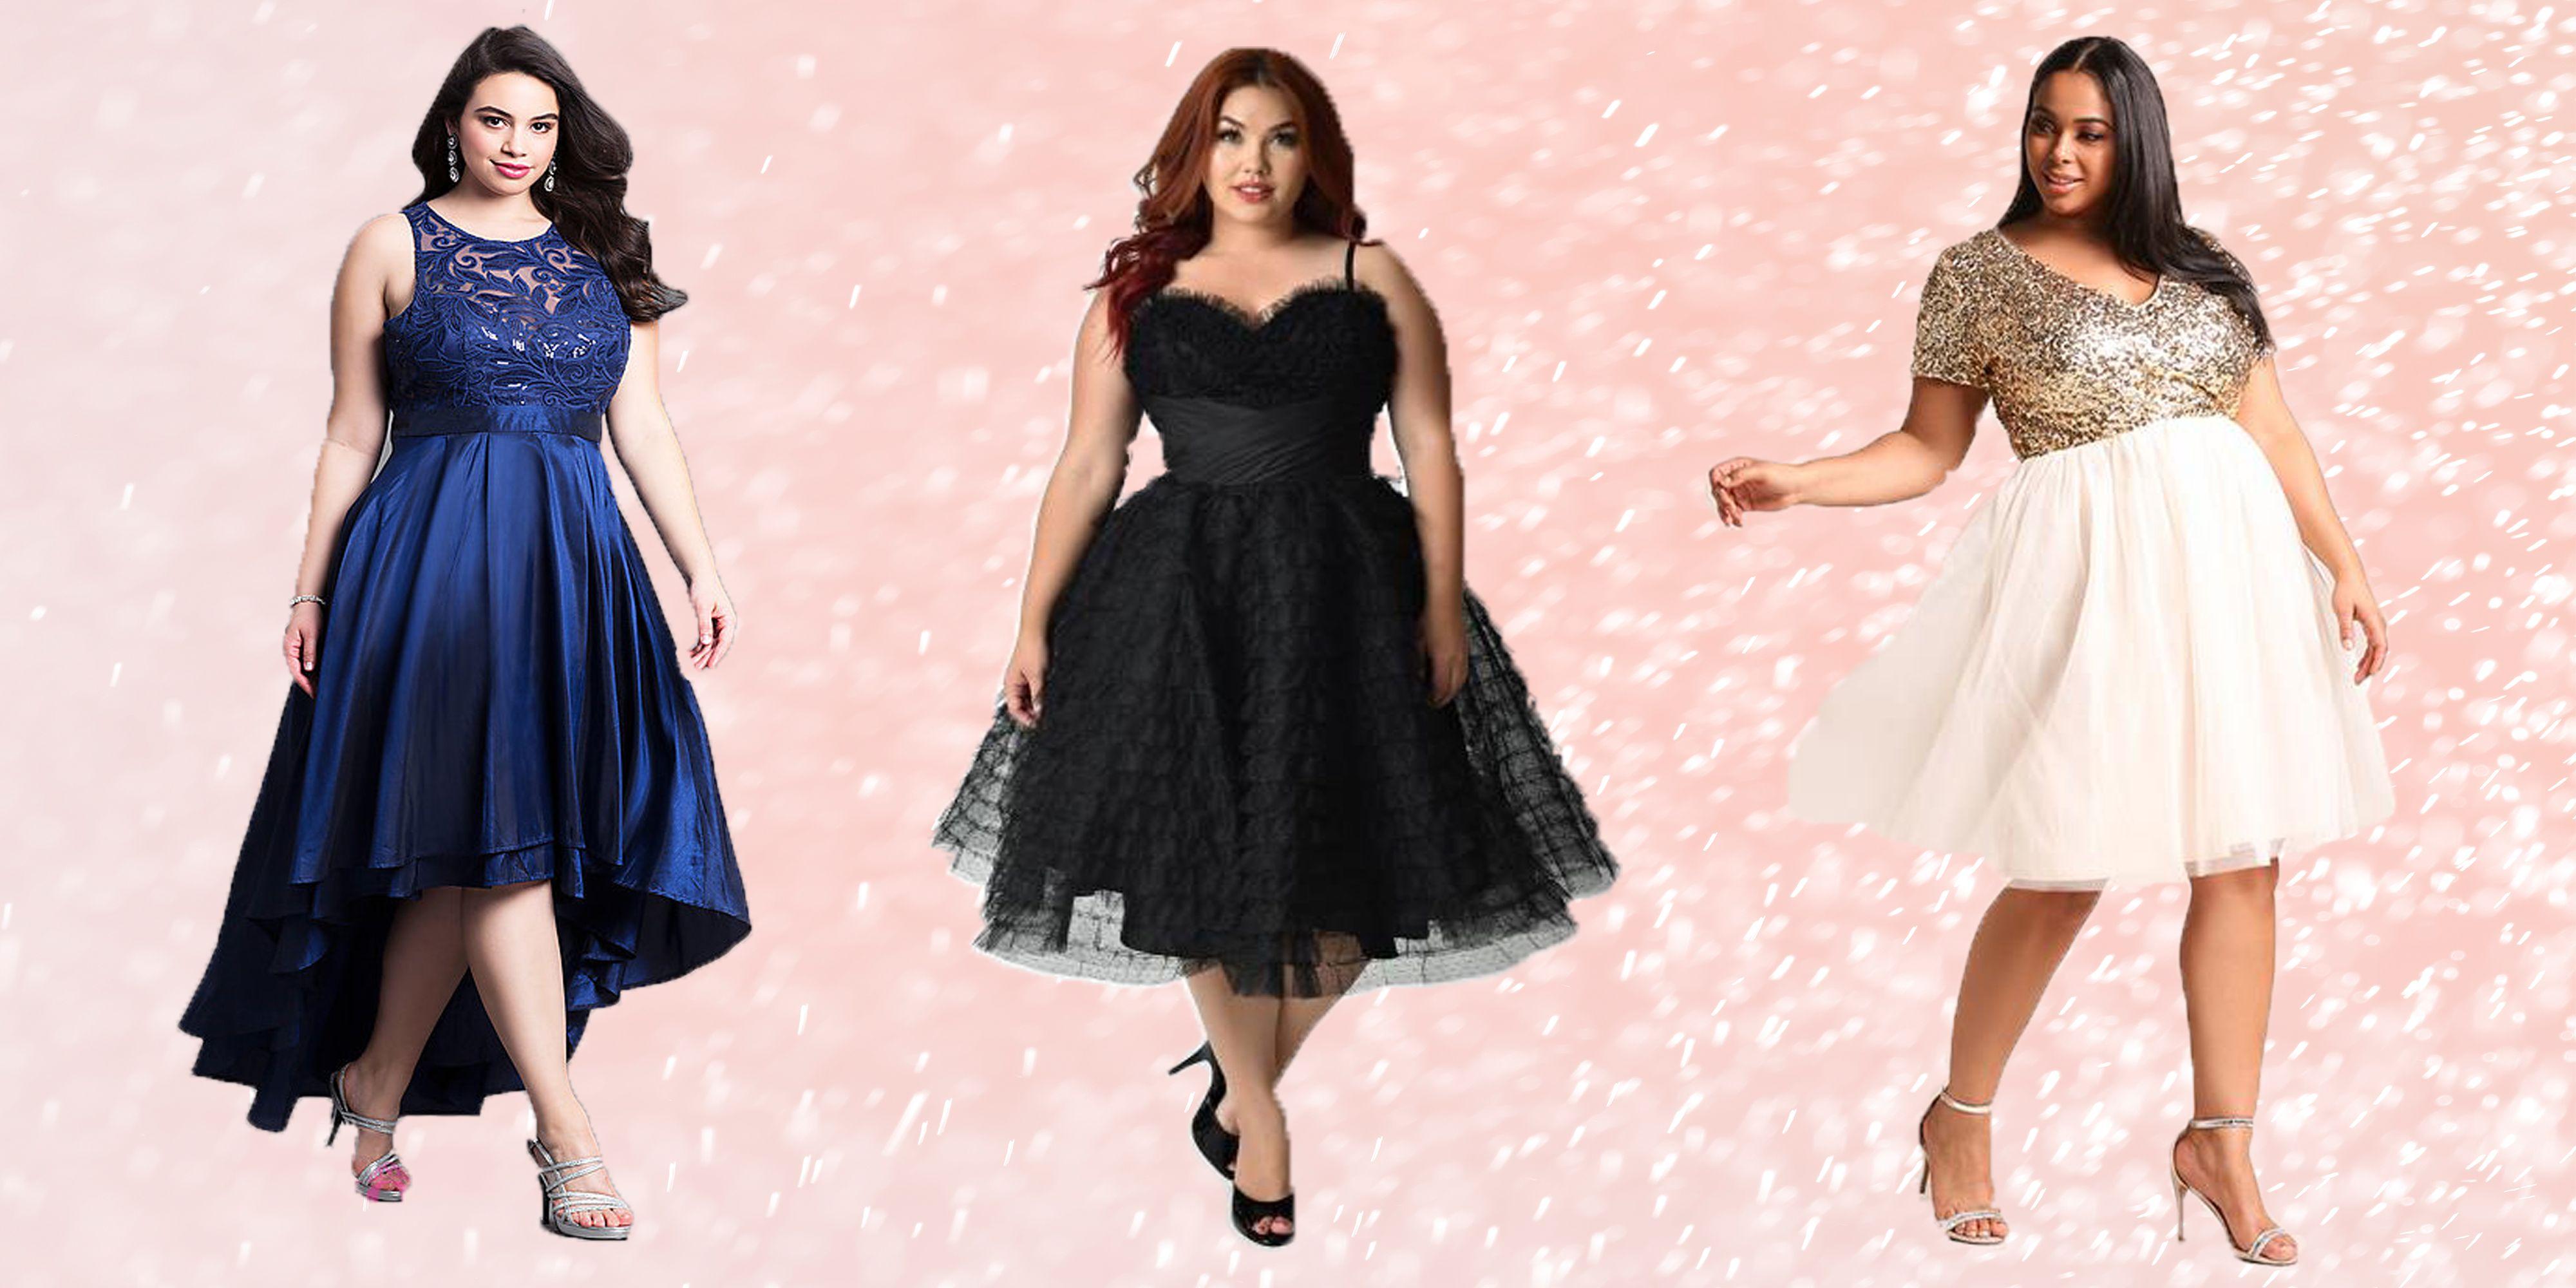 16 Best 8th Grade Graduation Dresses Images On Pinterest - MVlC